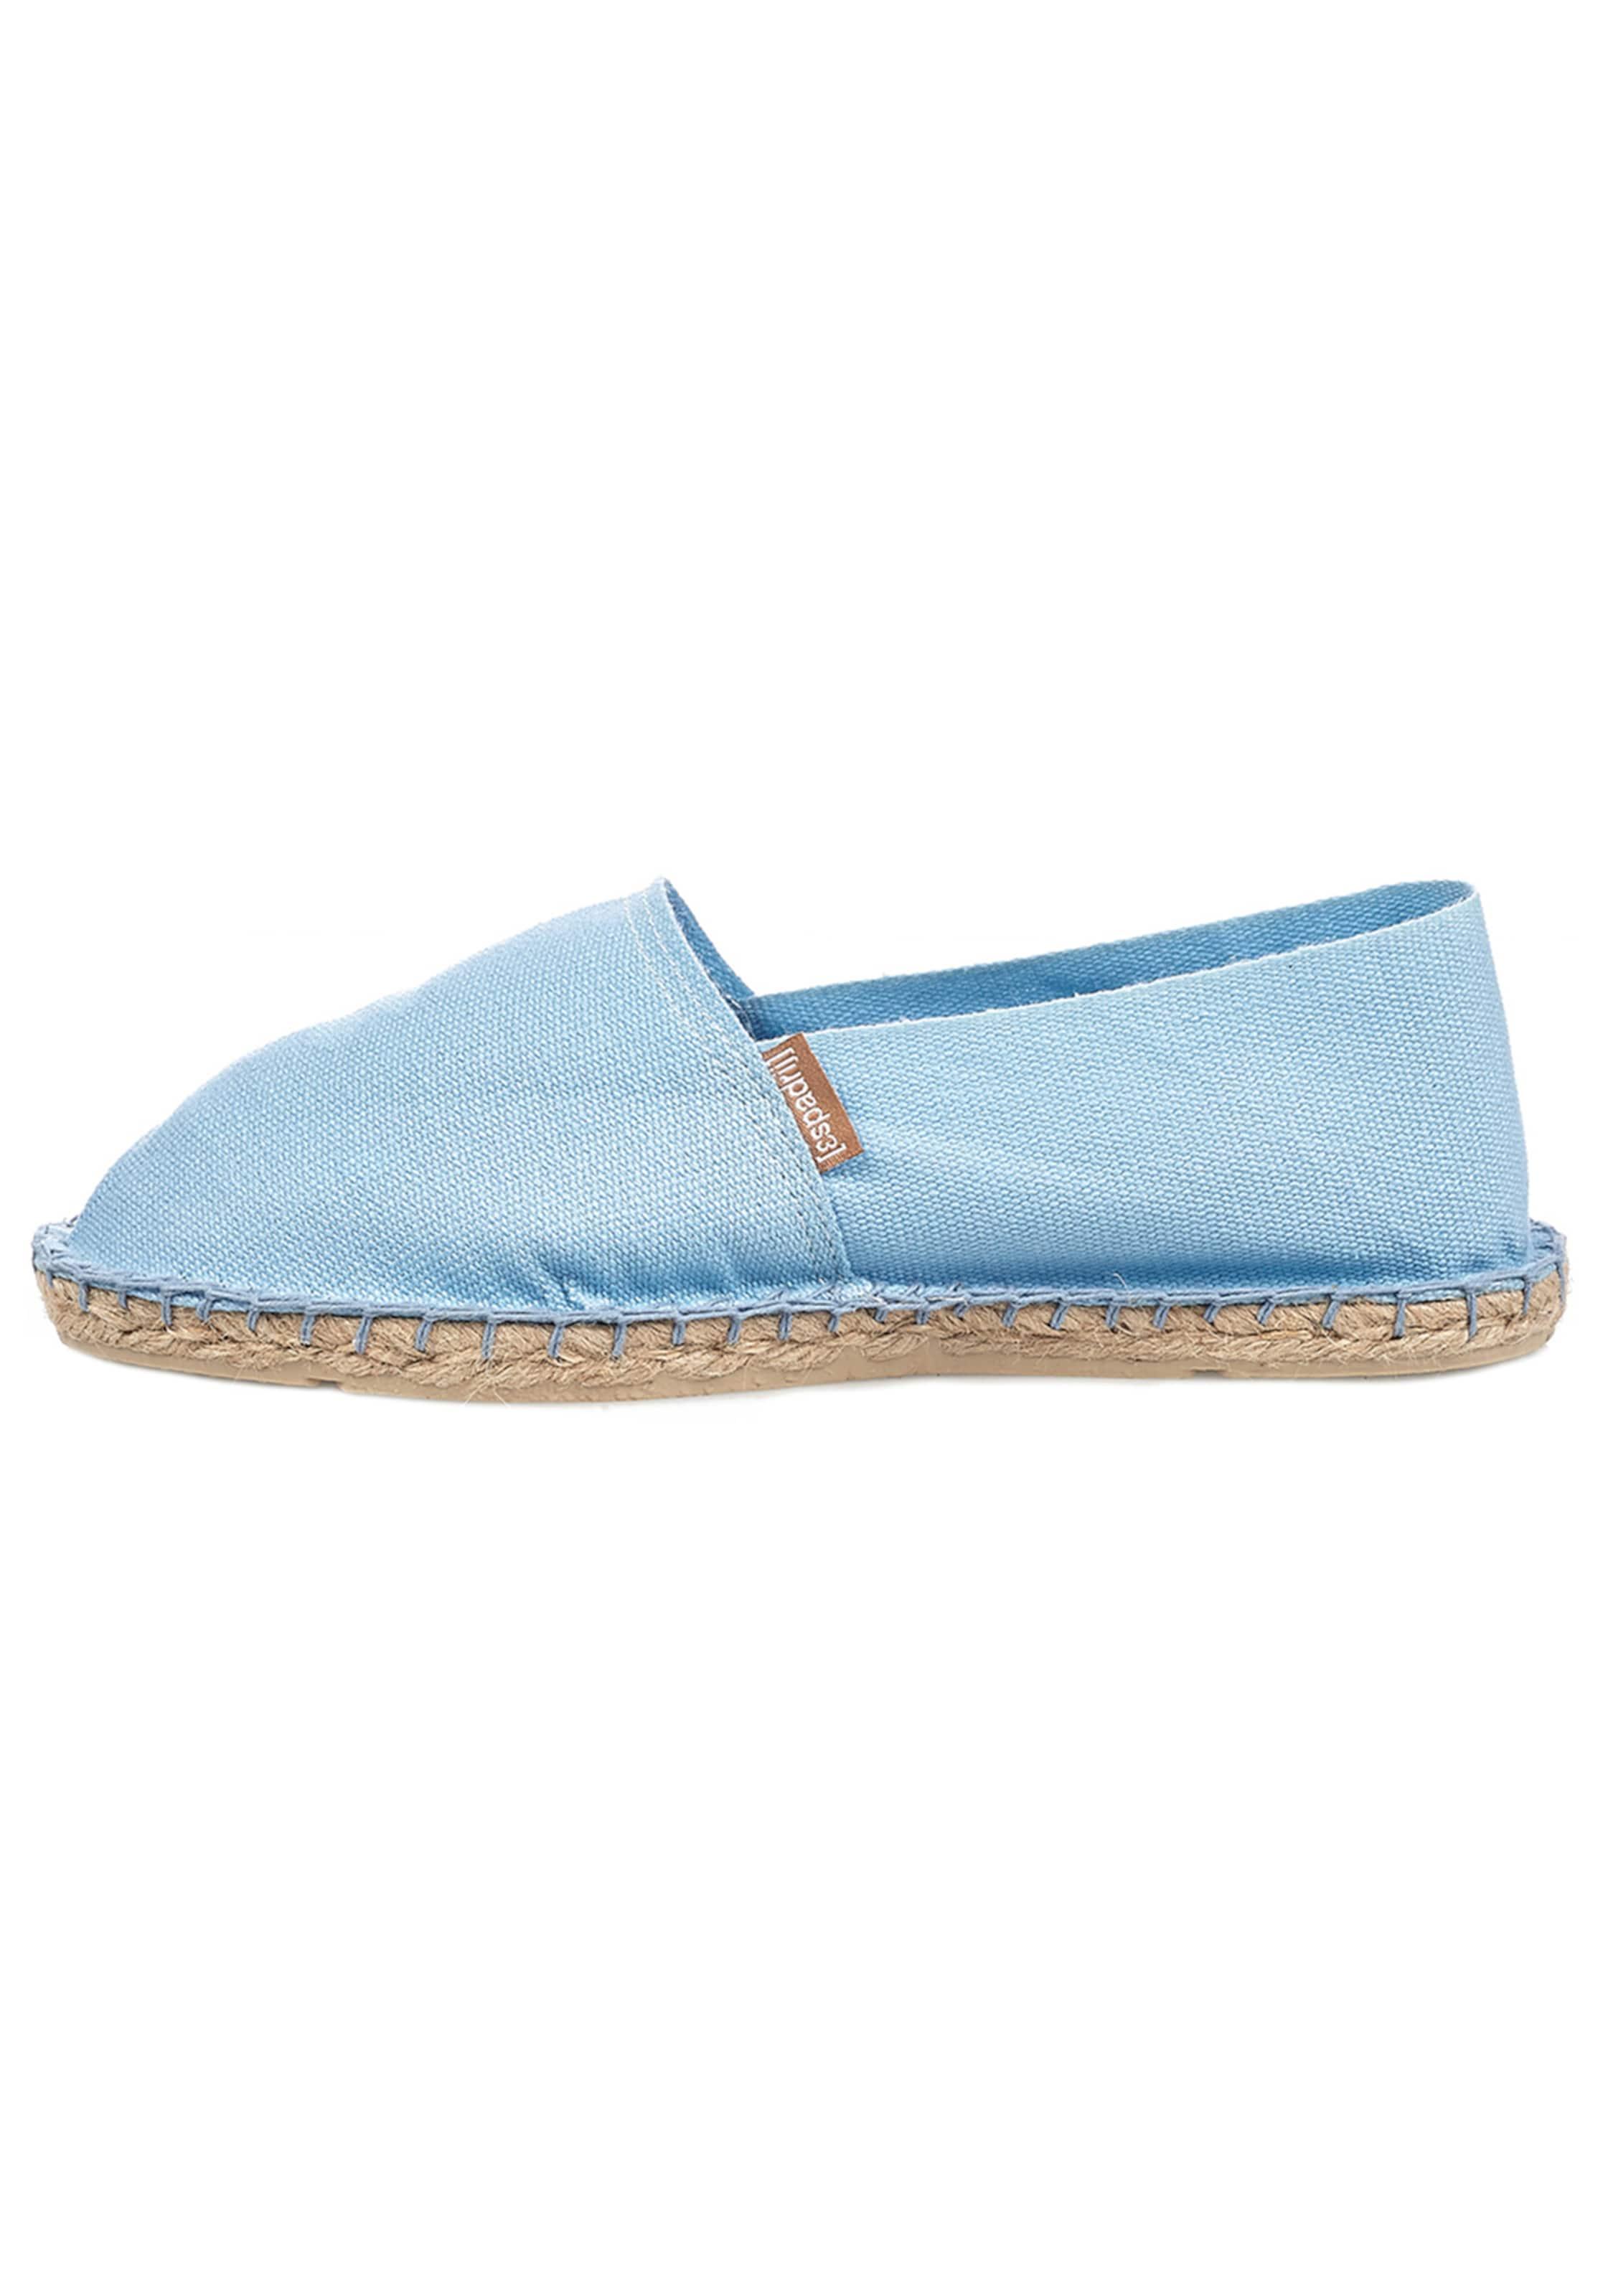 espadrij l´originale Slip Ons Günstige und langlebige Schuhe